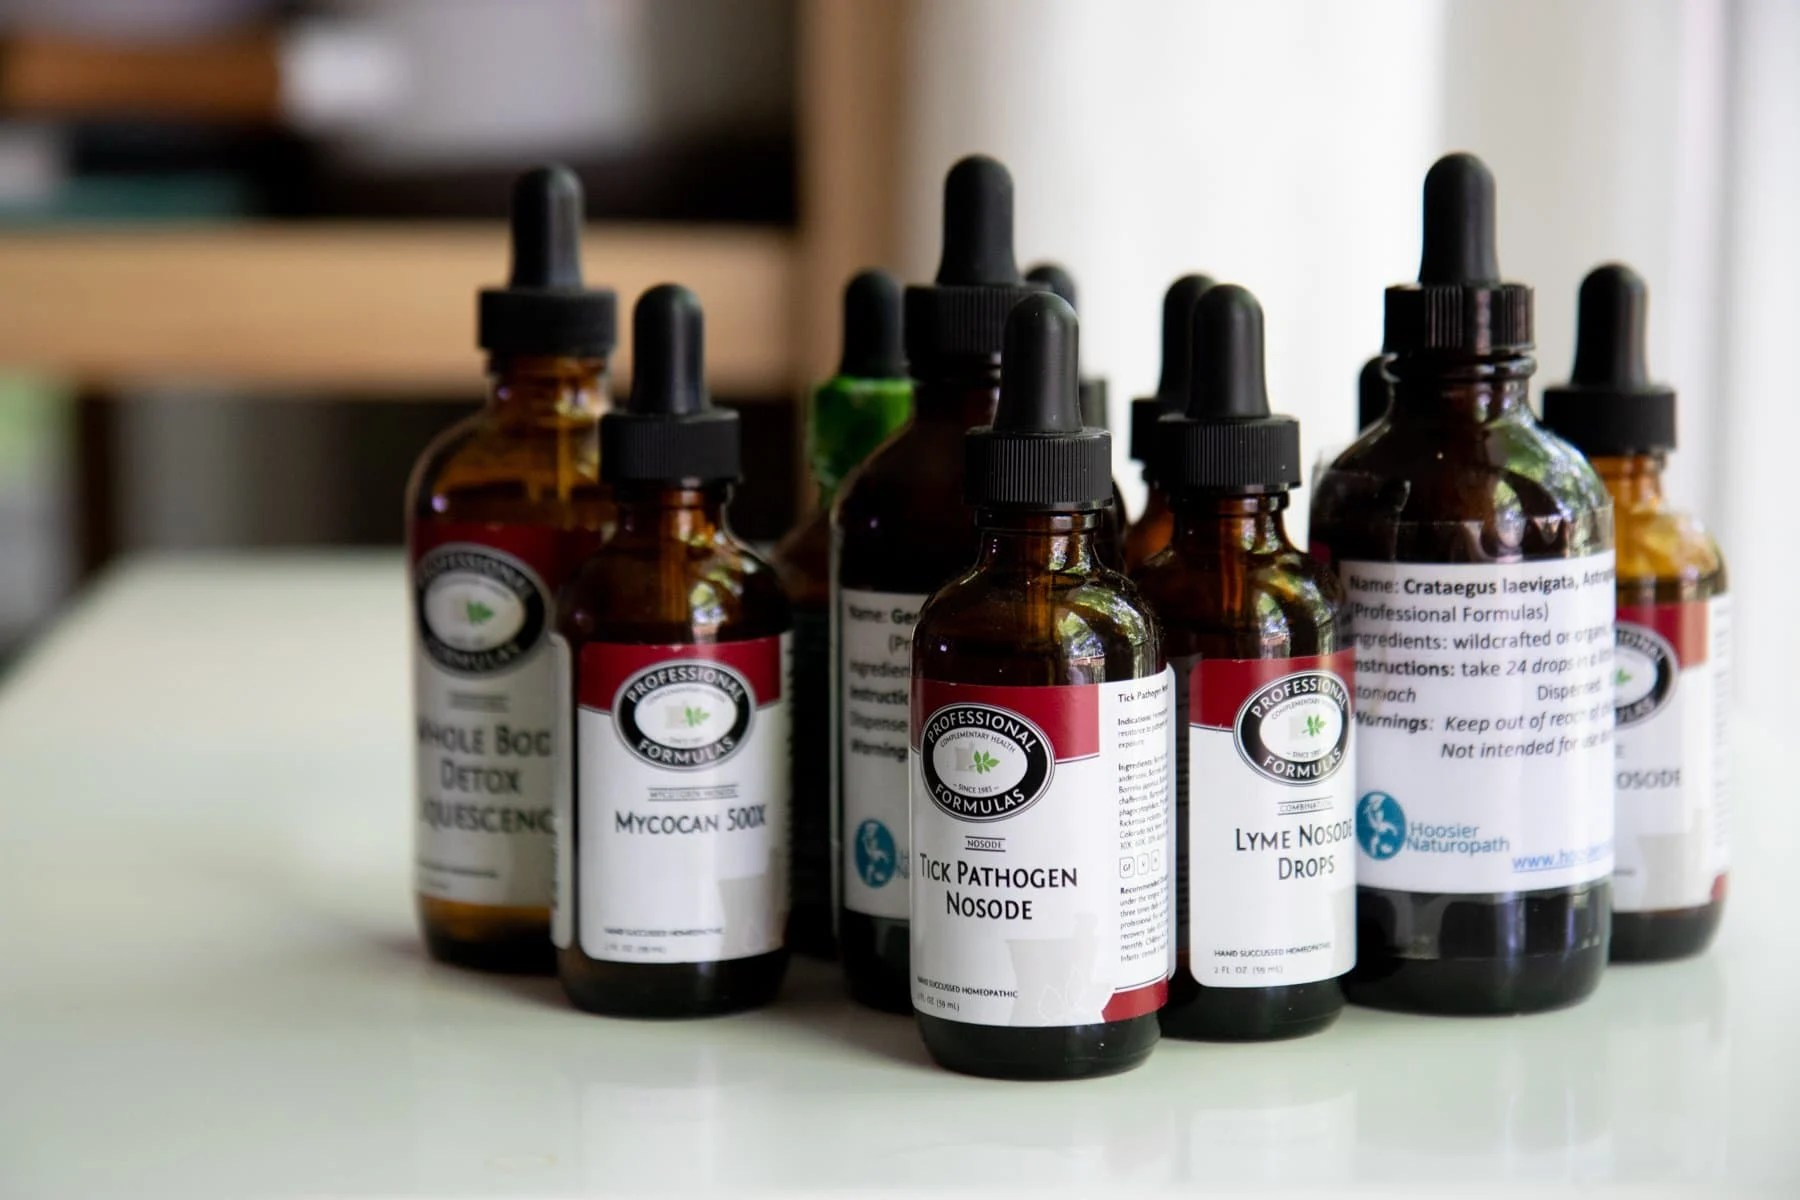 Cluster of eyedropper bottles with herbal remedies for Lyme Disease